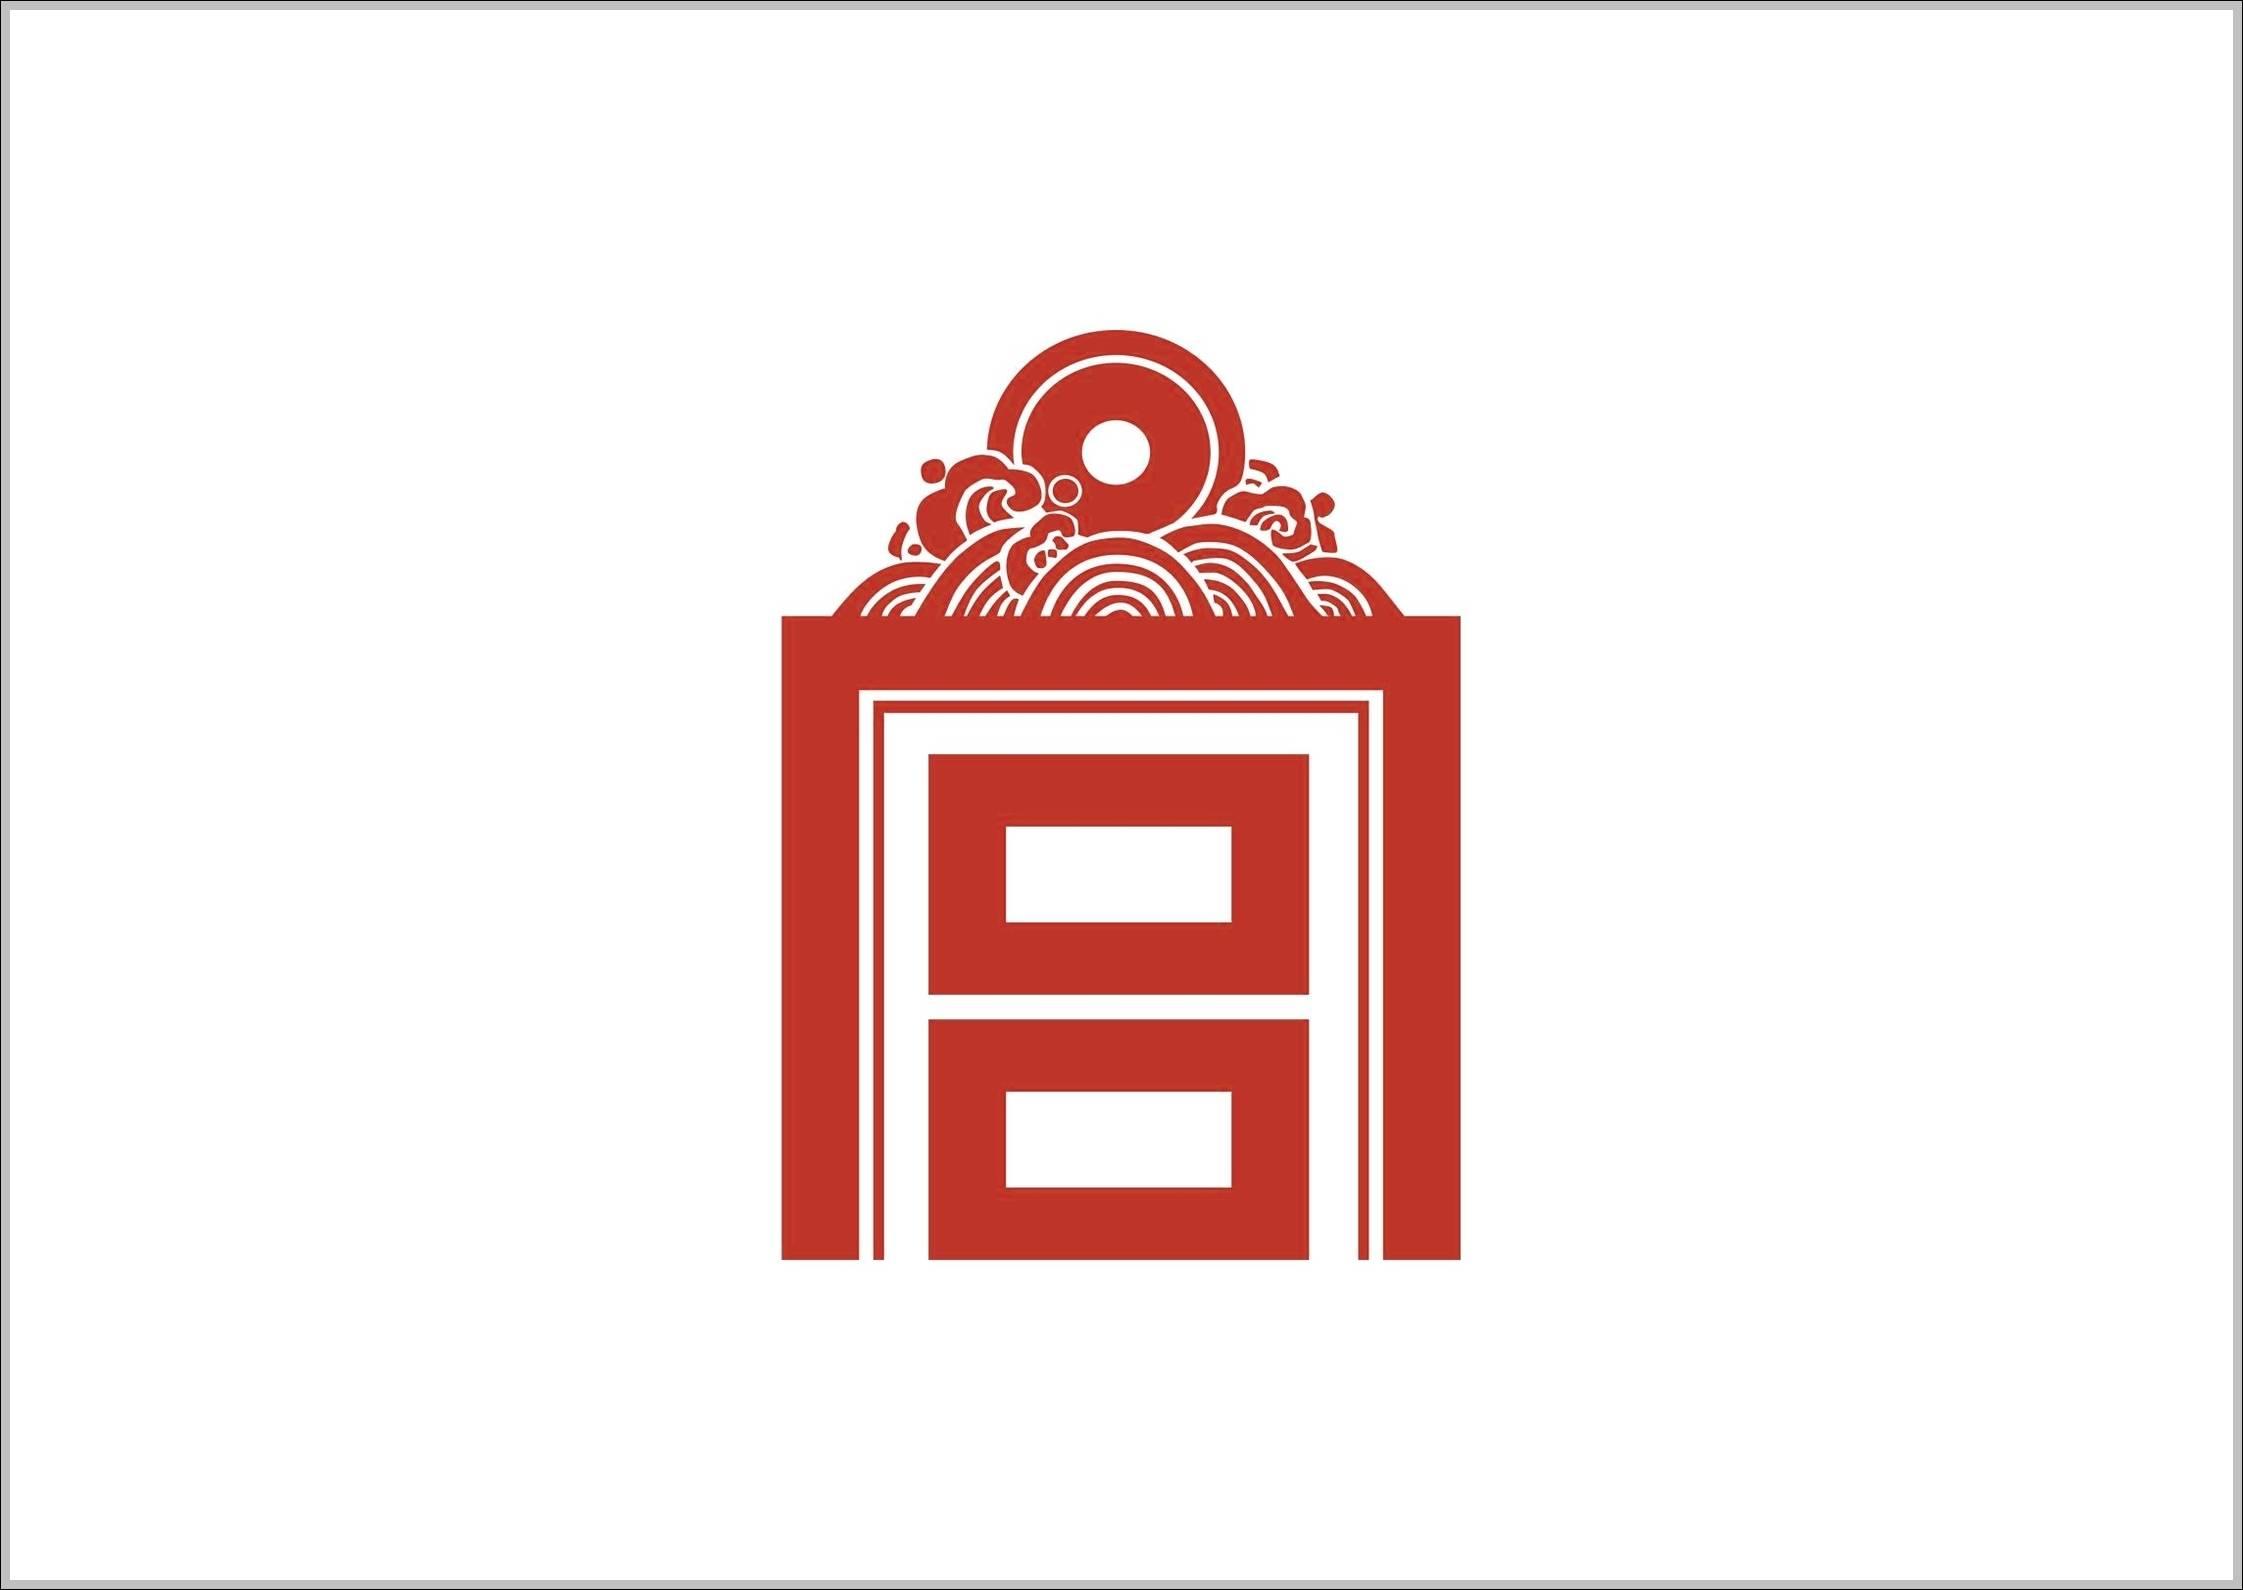 The Palace Museum logo